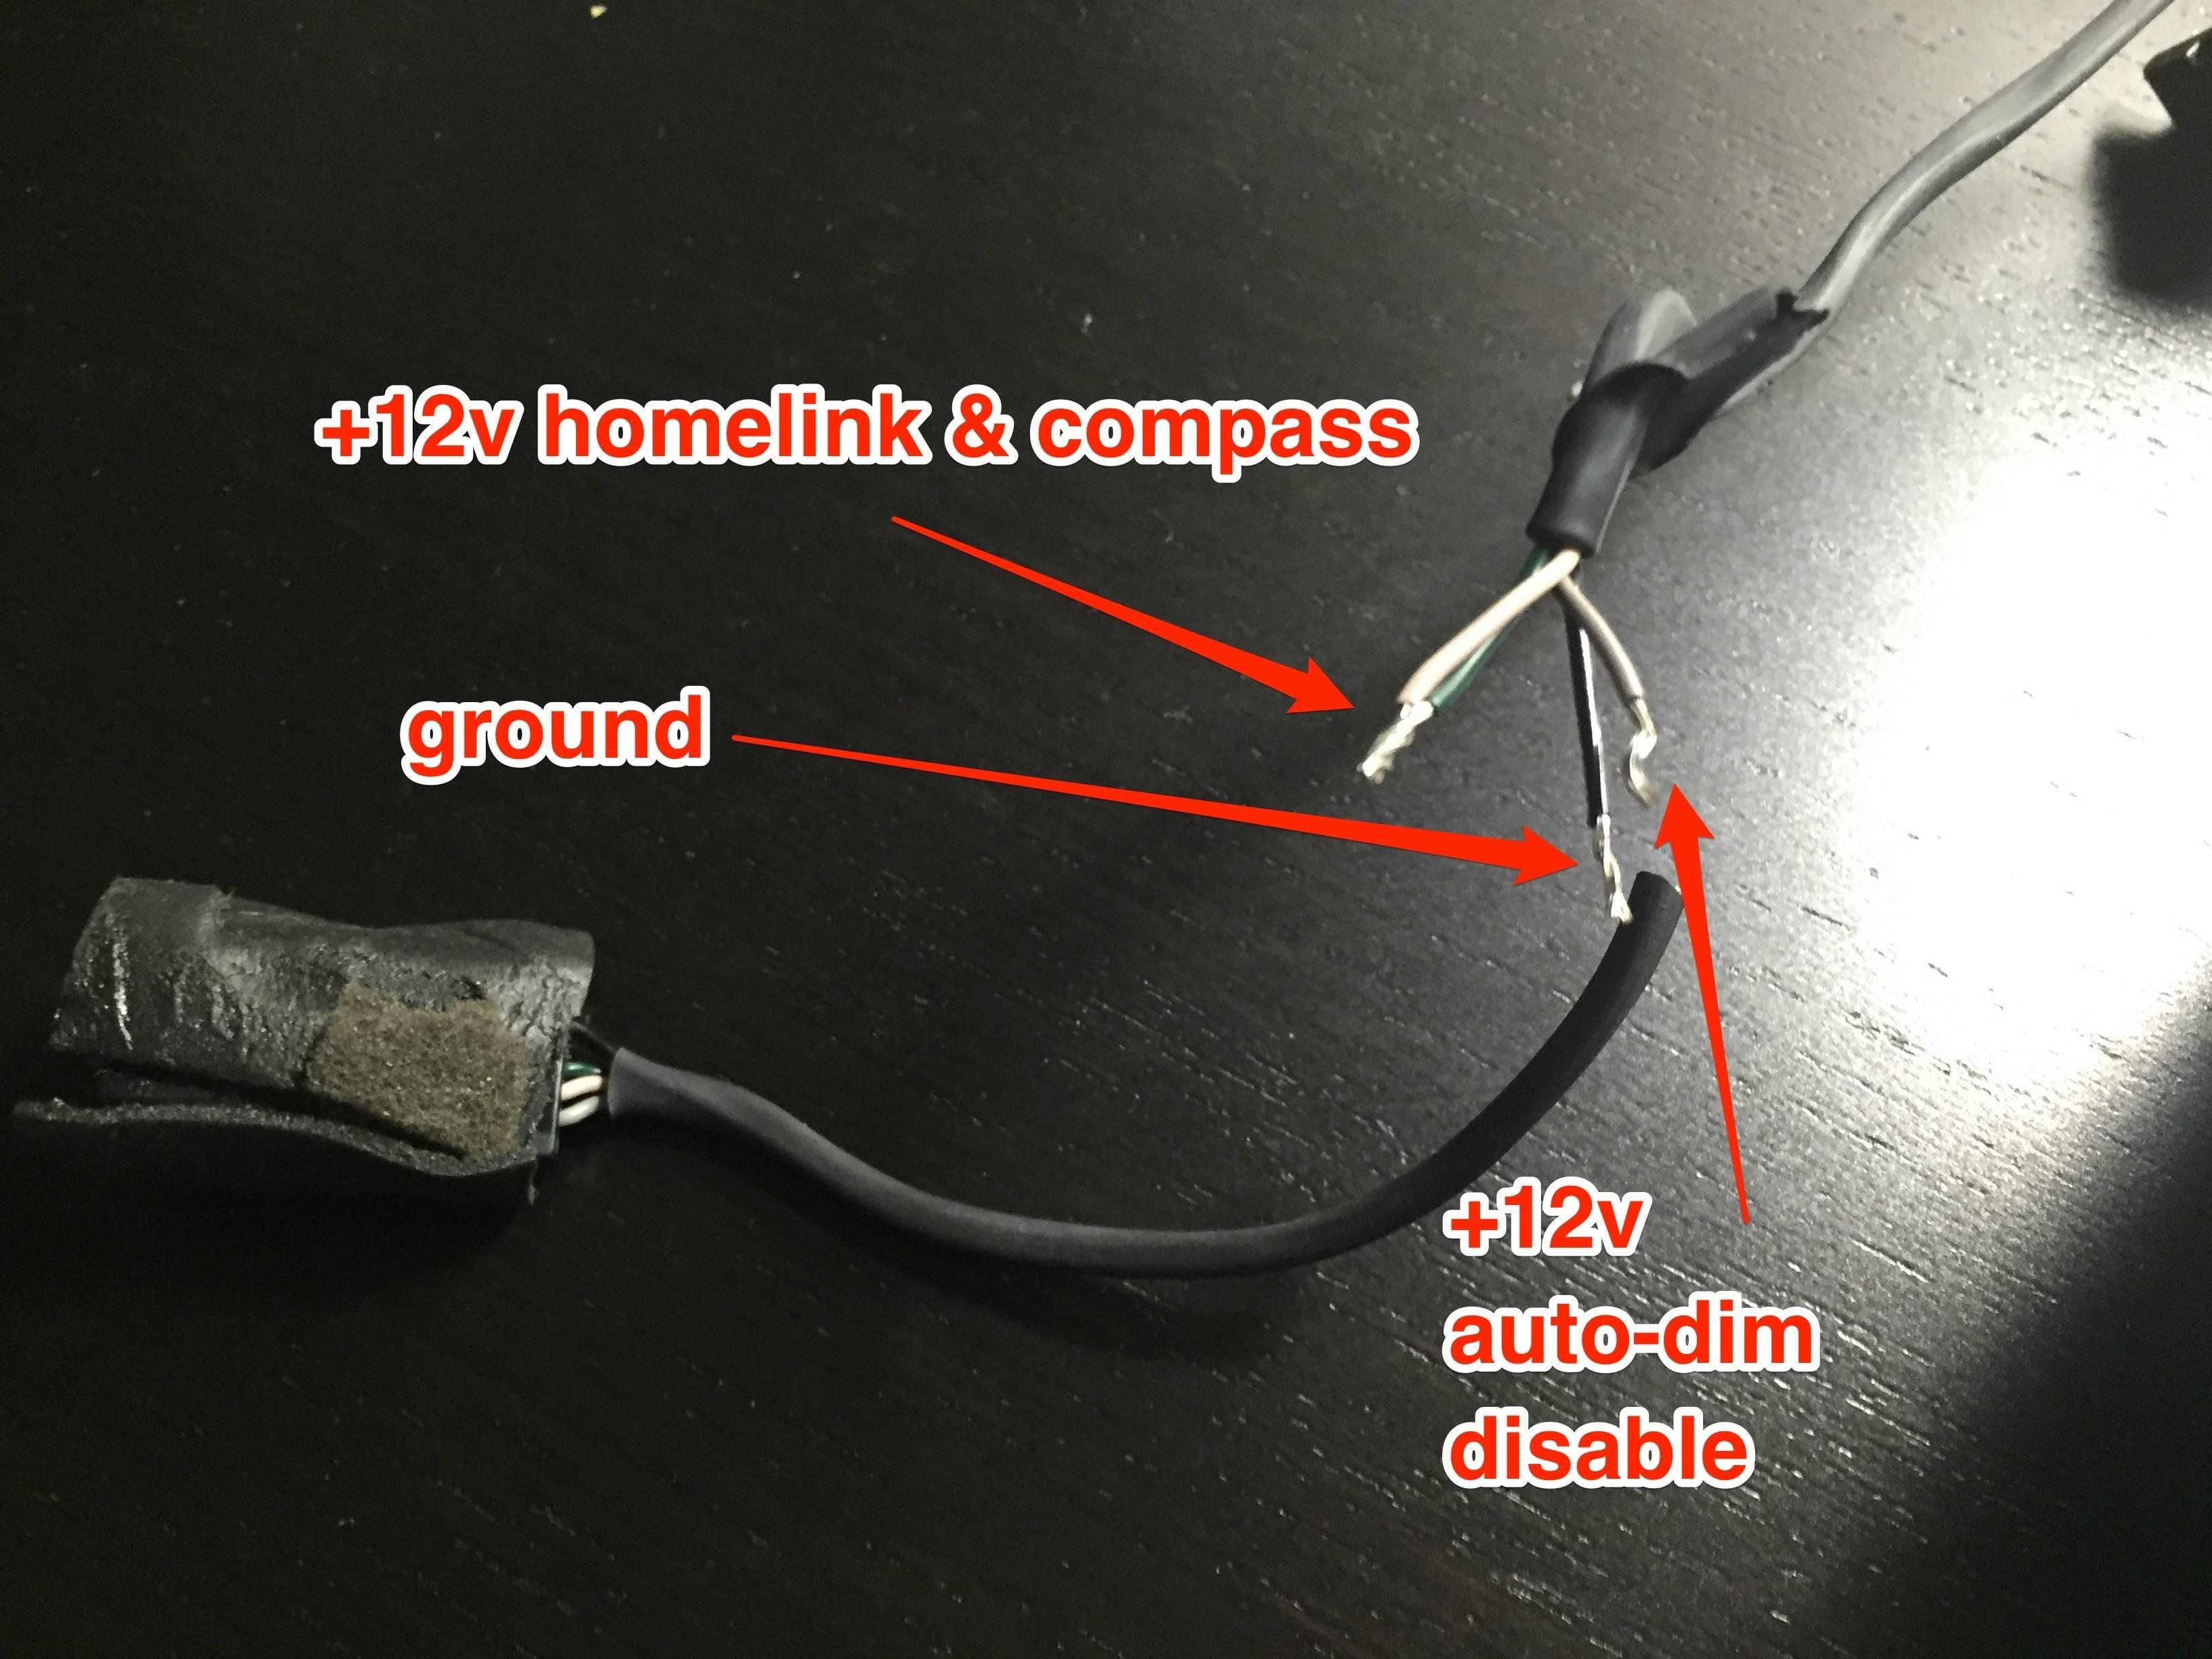 Gentex 536 Wiring Diagram Dyi Auto Dimming Mirror W Homelink pass Installation [